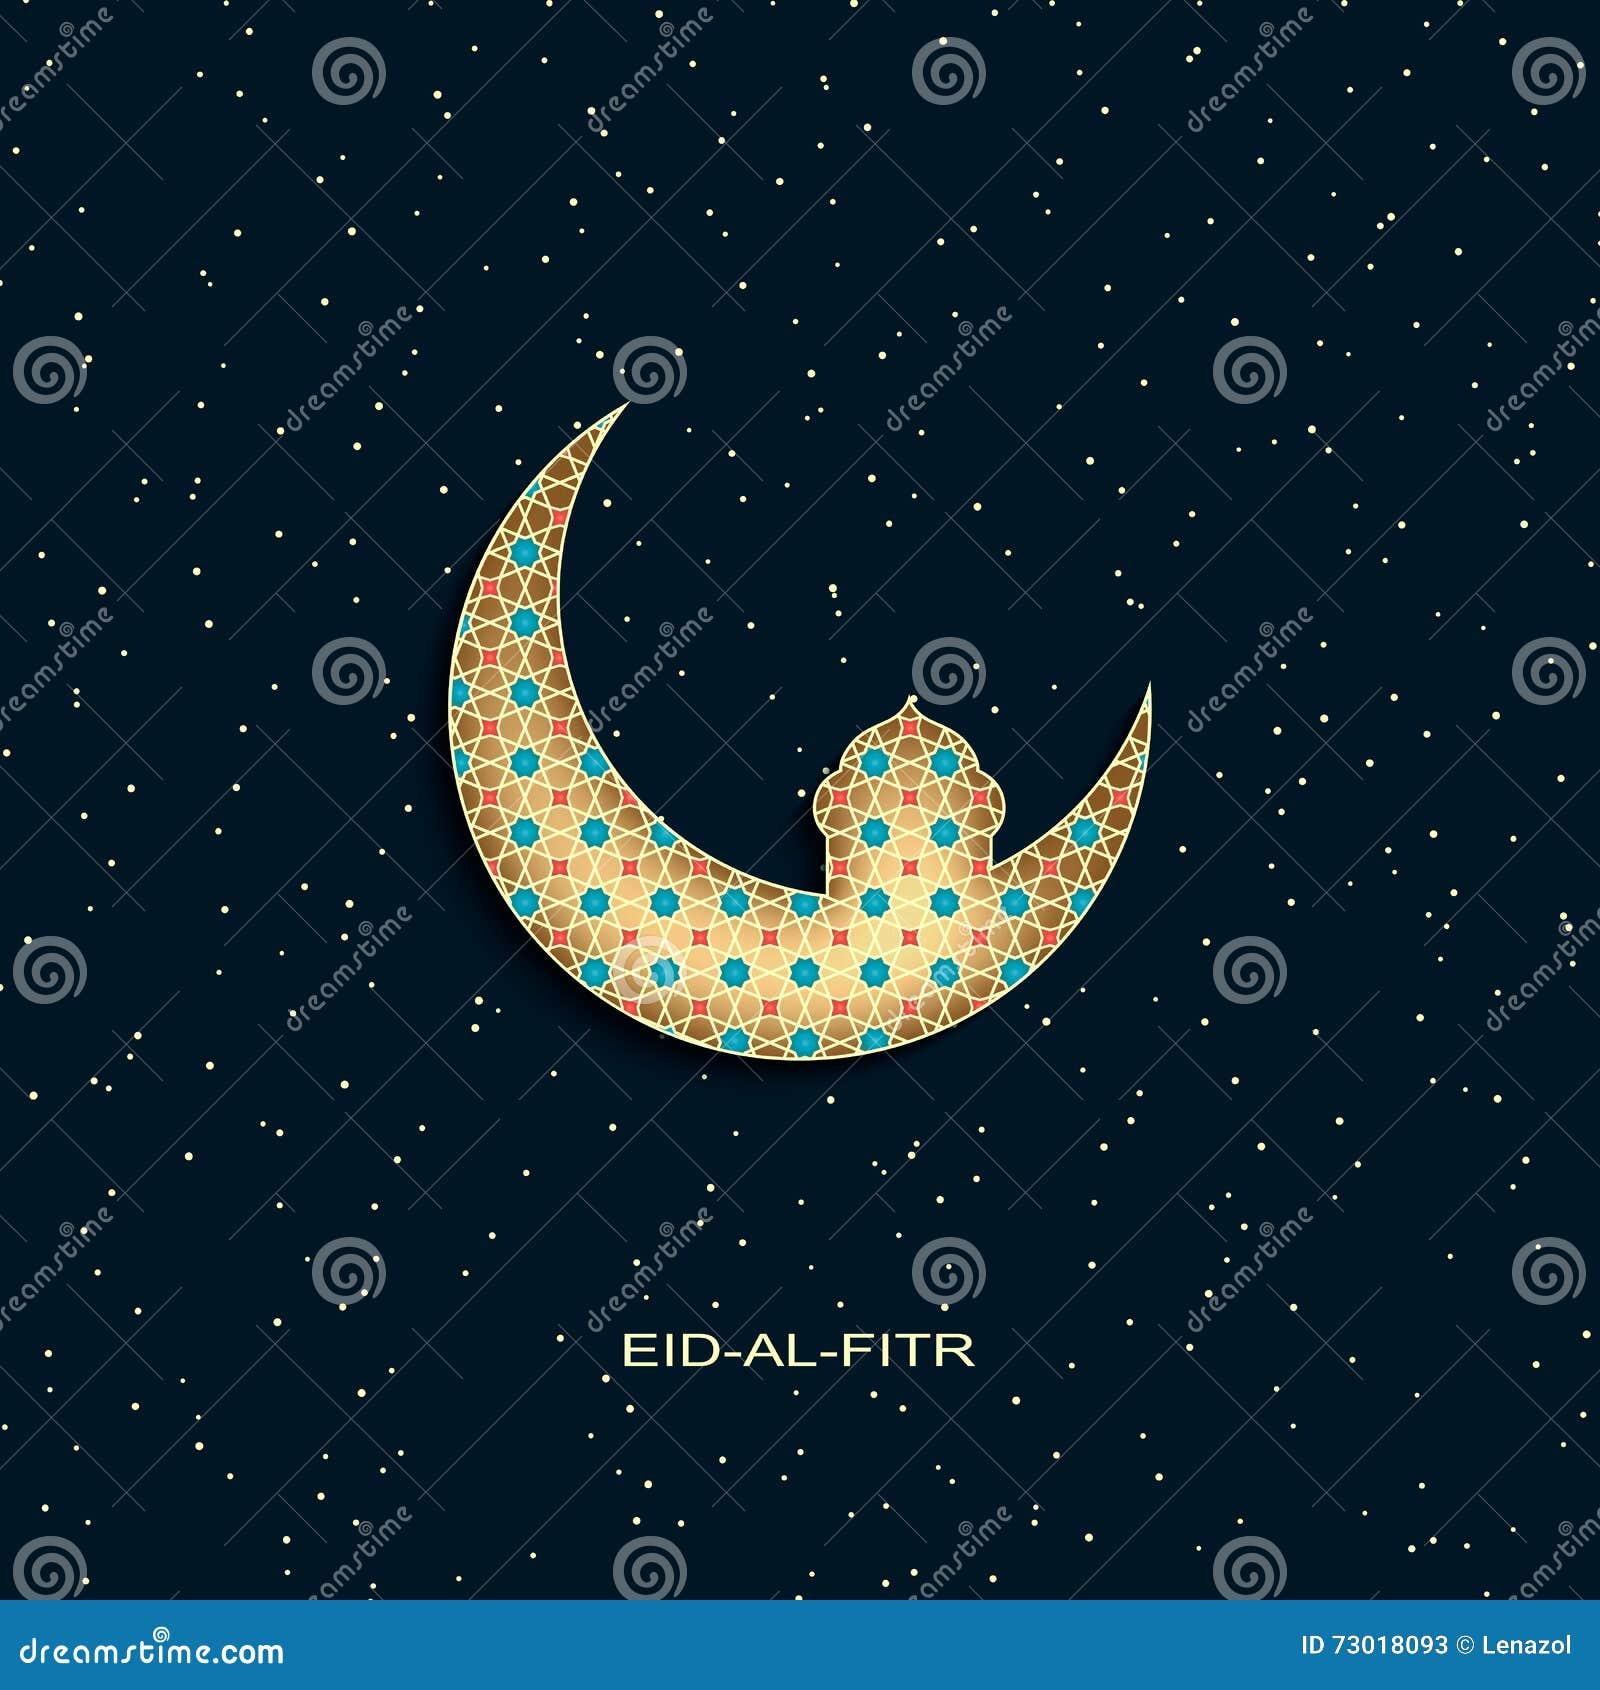 Wonderful Spring Eid Al-Fitr Decorations - eid-al-fitr-background-golden-decorated-moon-star-mosque-vector-73018093  Picture_4303 .jpg